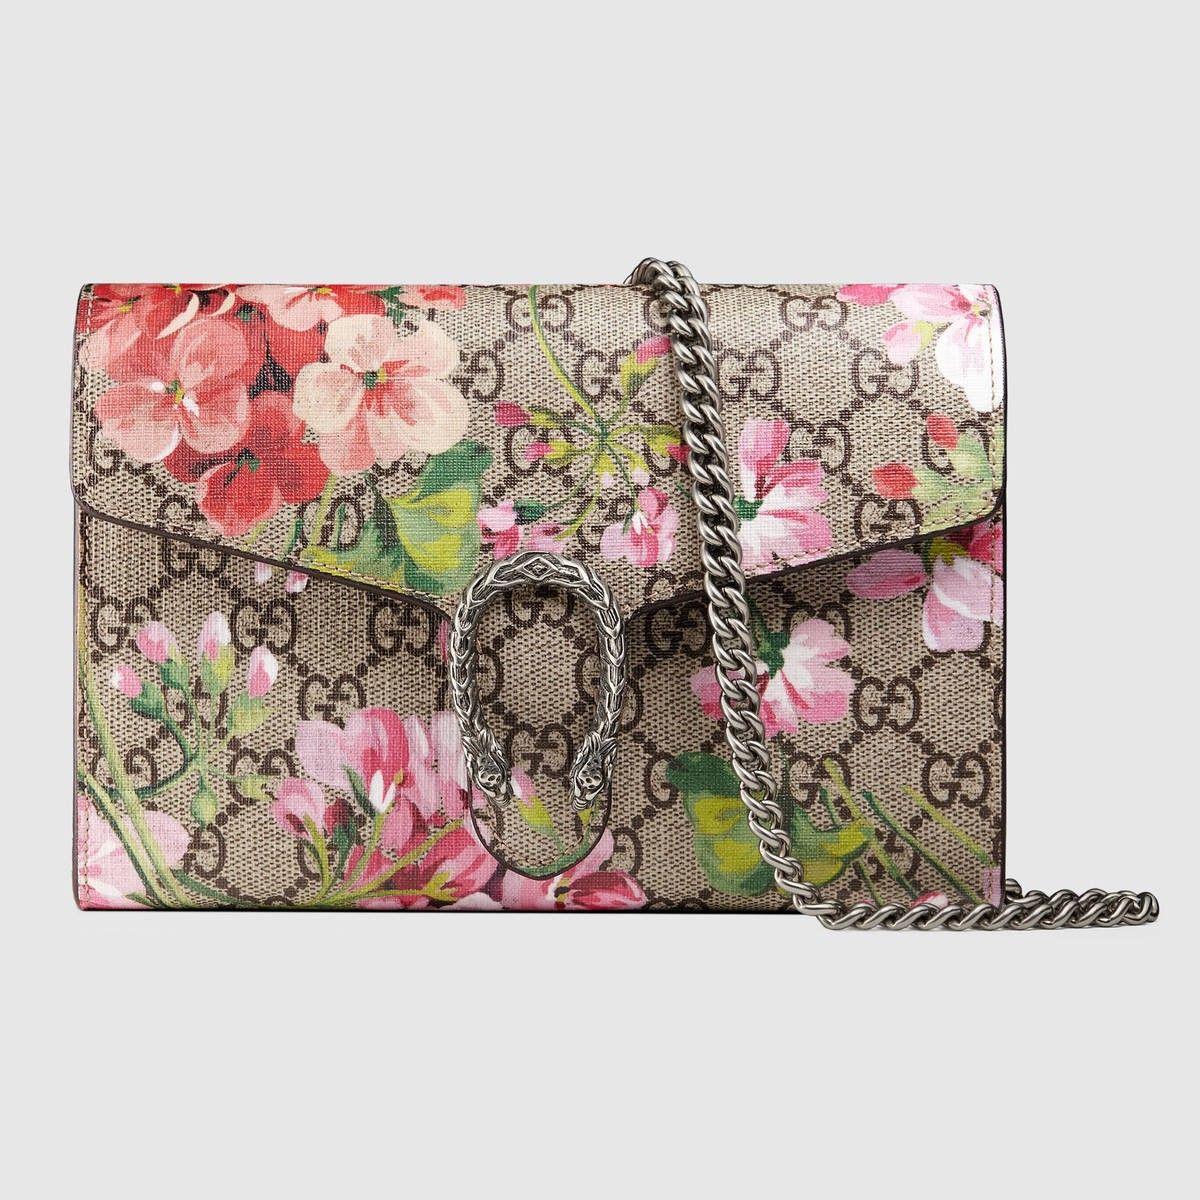 e8b47cb6 GUCCI Dionysus Blooms print mini chain bag - antique rose blooms. #gucci # bags #shoulder bags #wallet #canvas #leather #accessories #